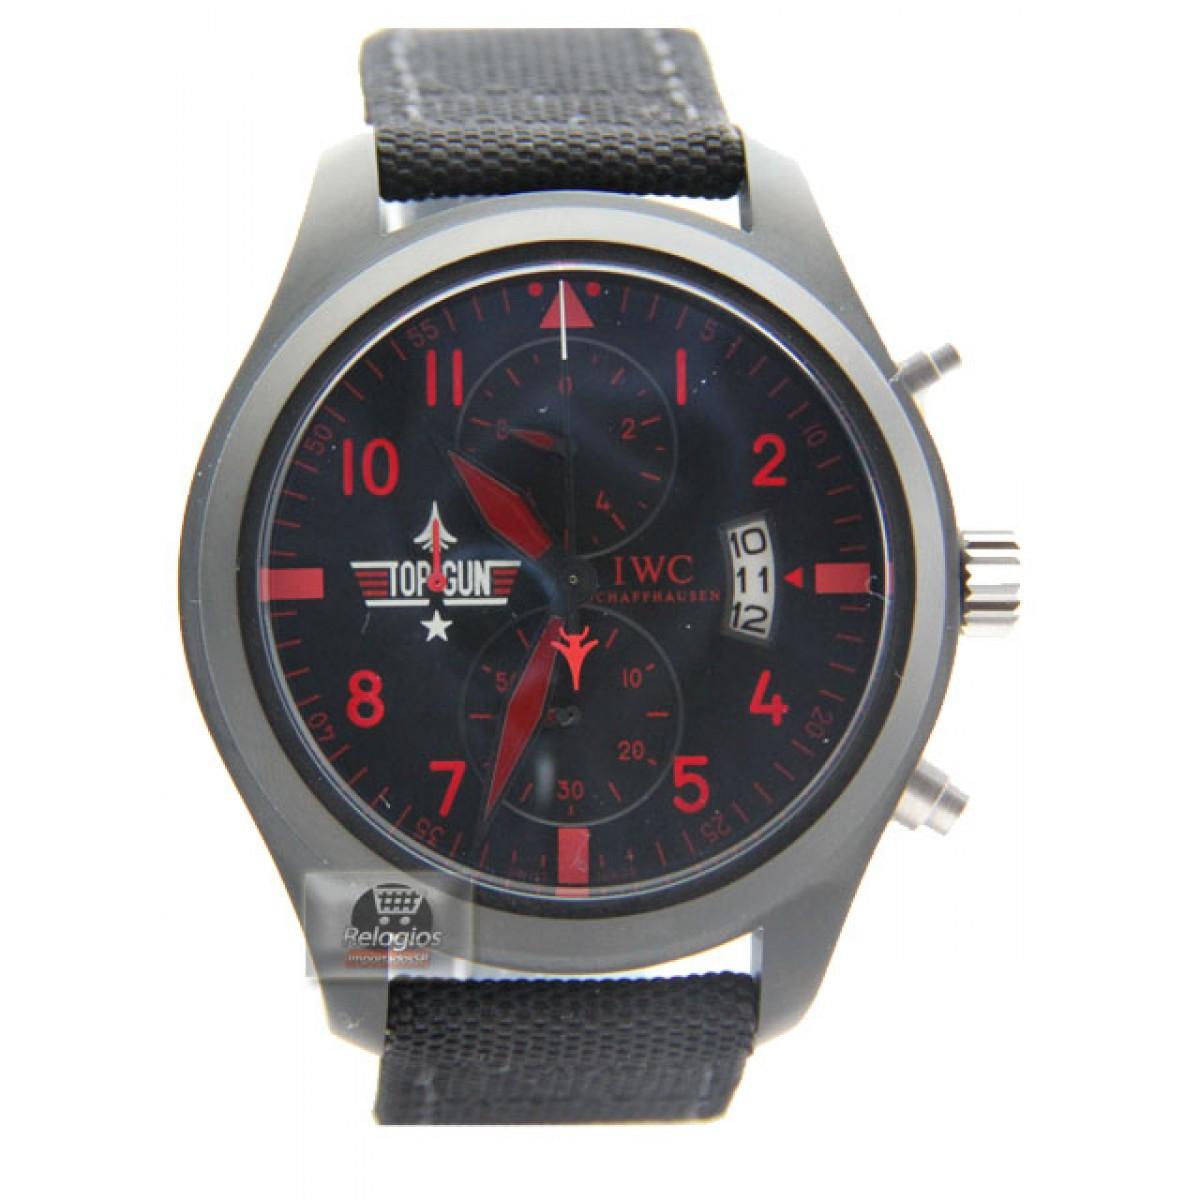 b27cfc250cd Relógio Réplica Iwc Top Gun Red